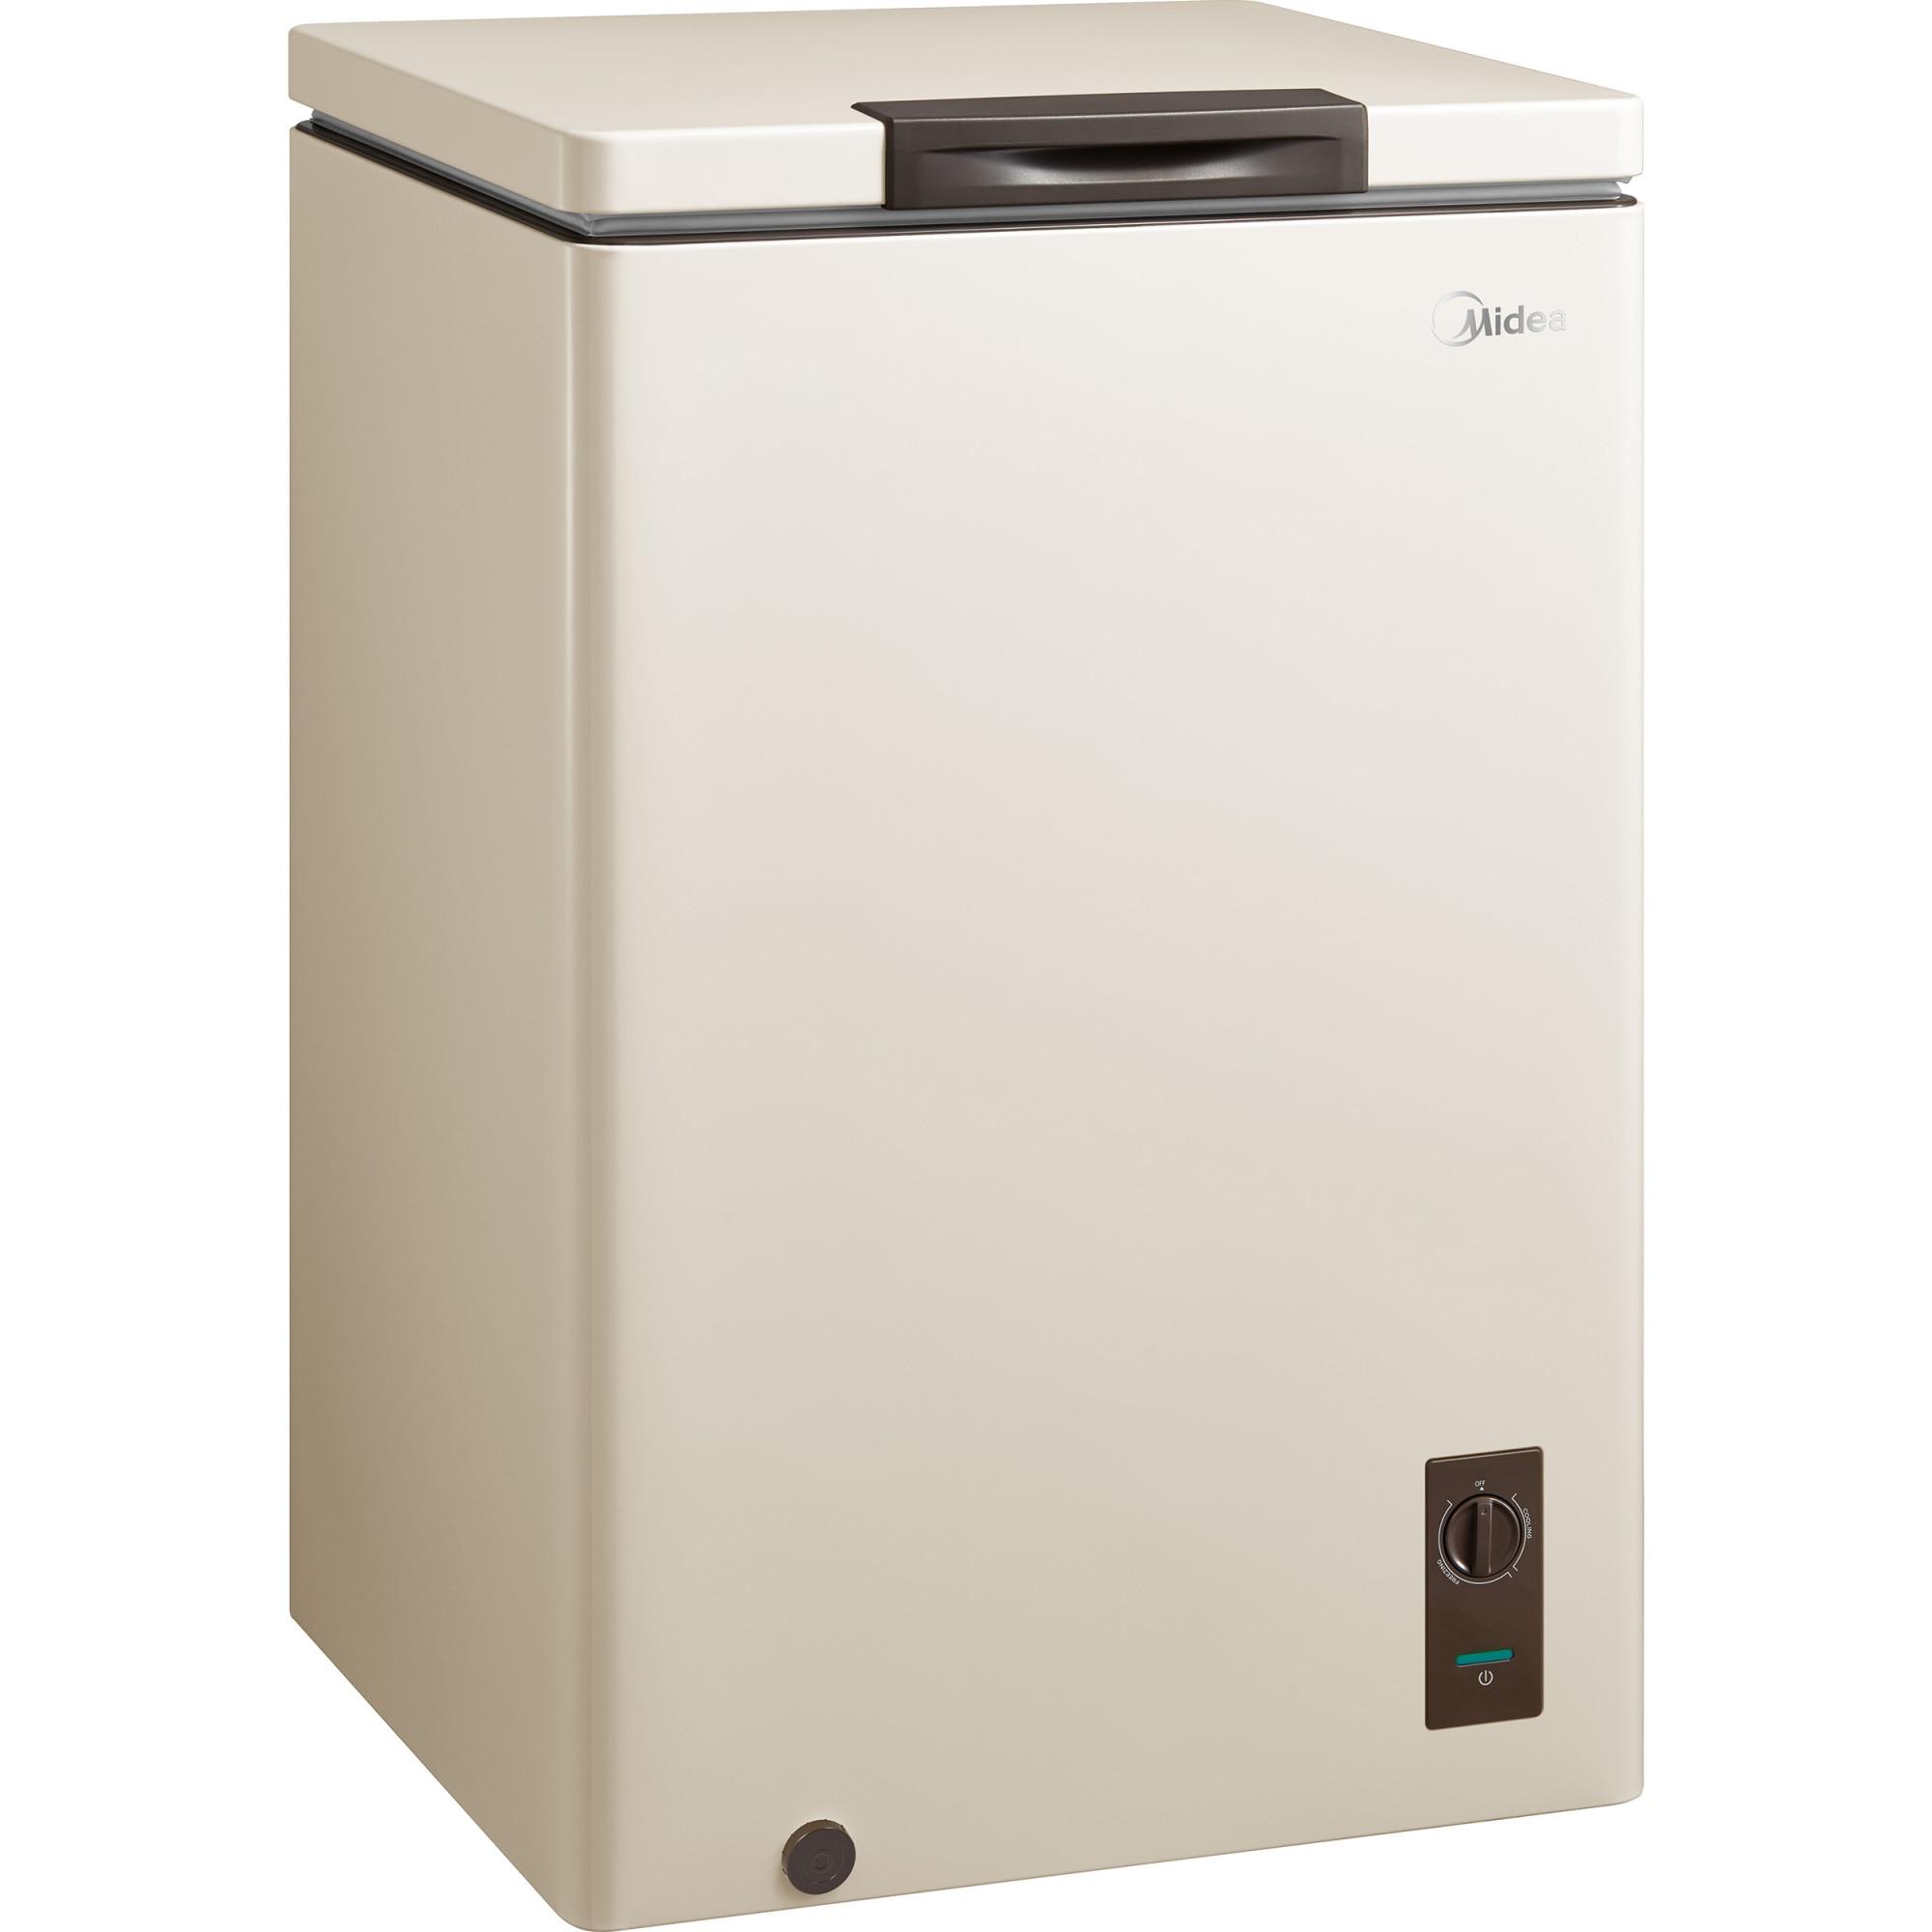 Fotografie Lada frigorifica MIDEA HS-131CNB, 99l, Functie frigider, LED, Clasa A+, Bej